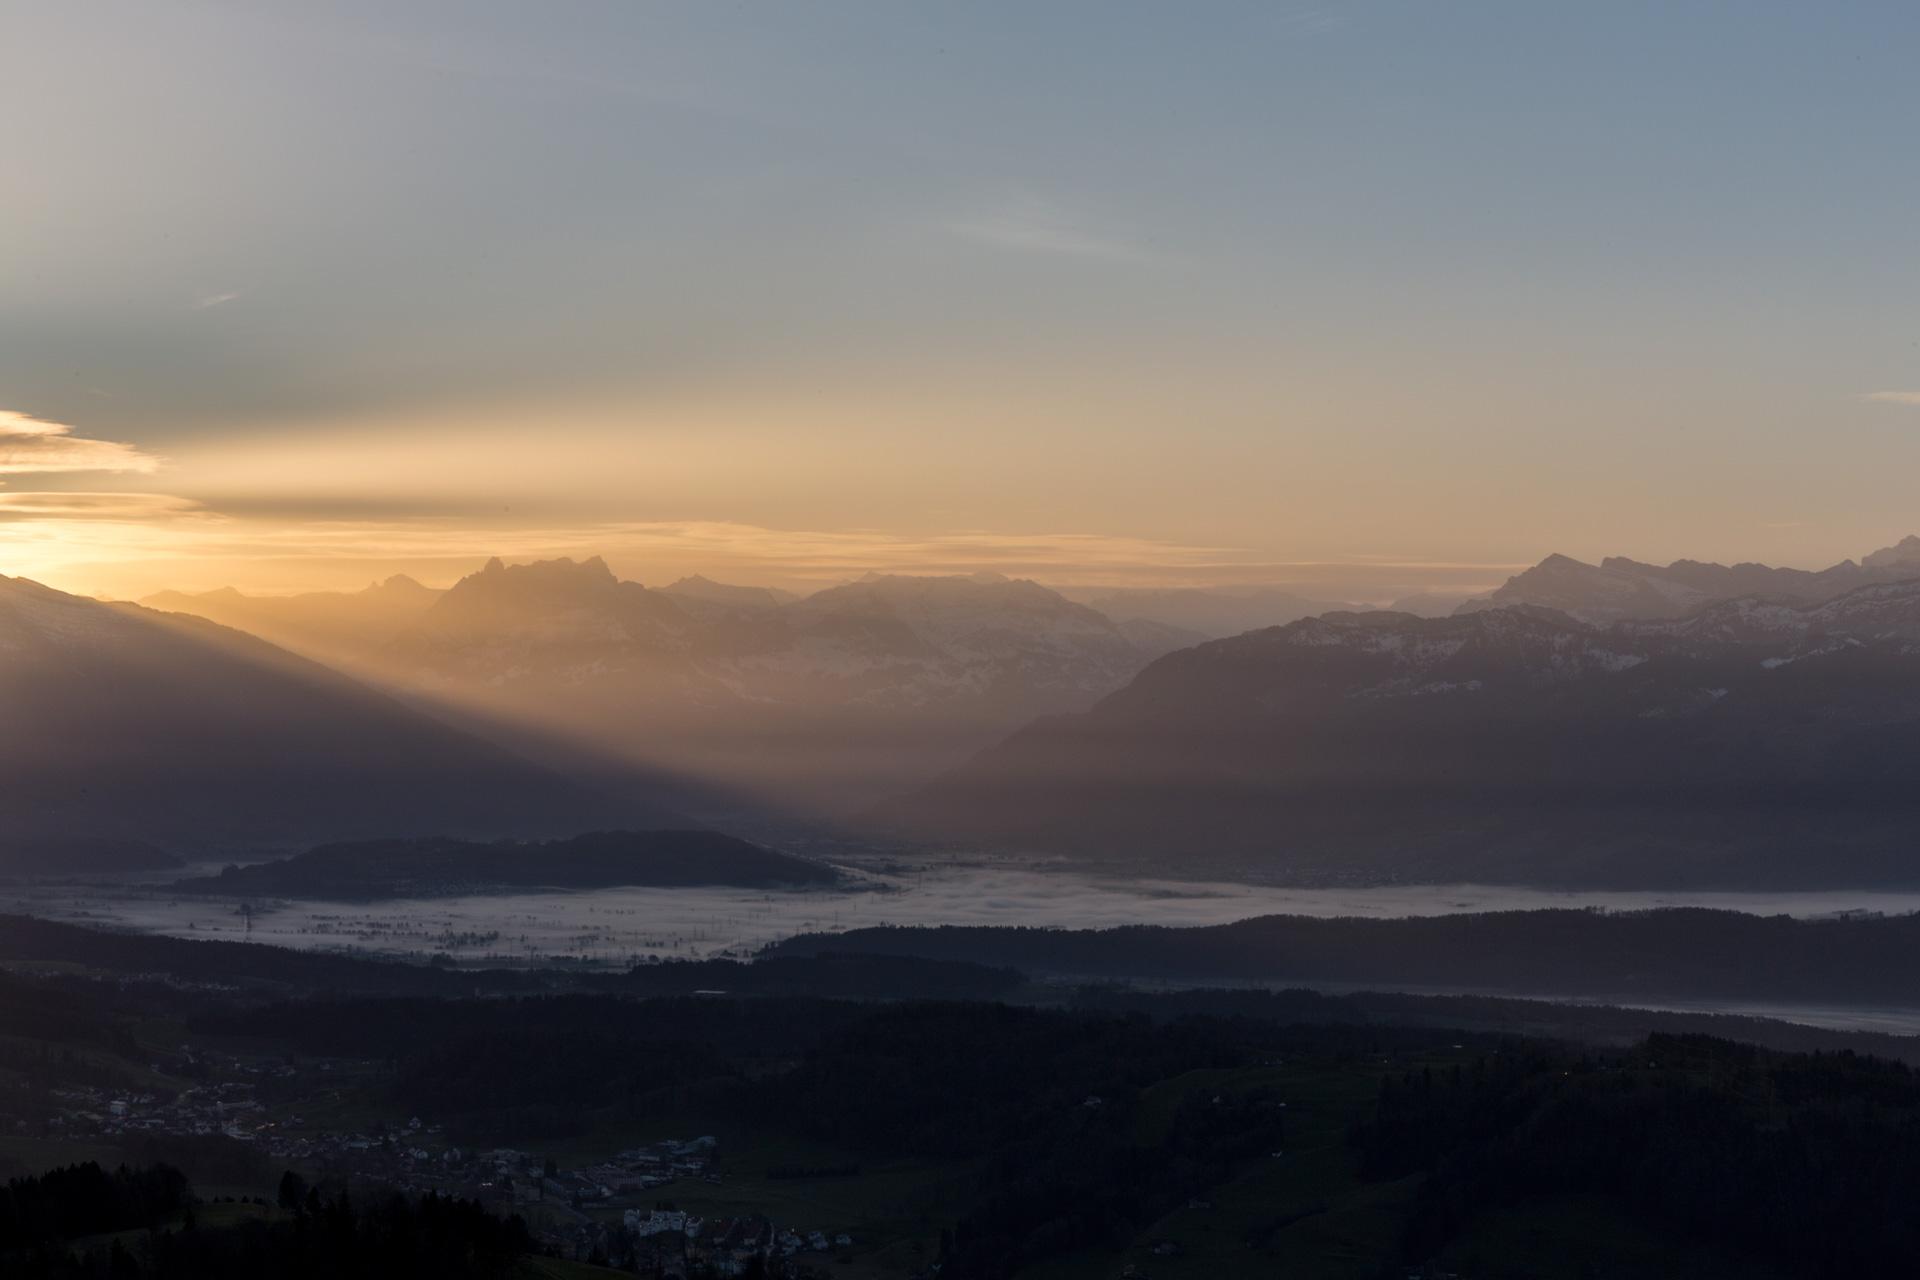 Sonnenaufgang-Bachtelturm_20151219_5972-1ebene